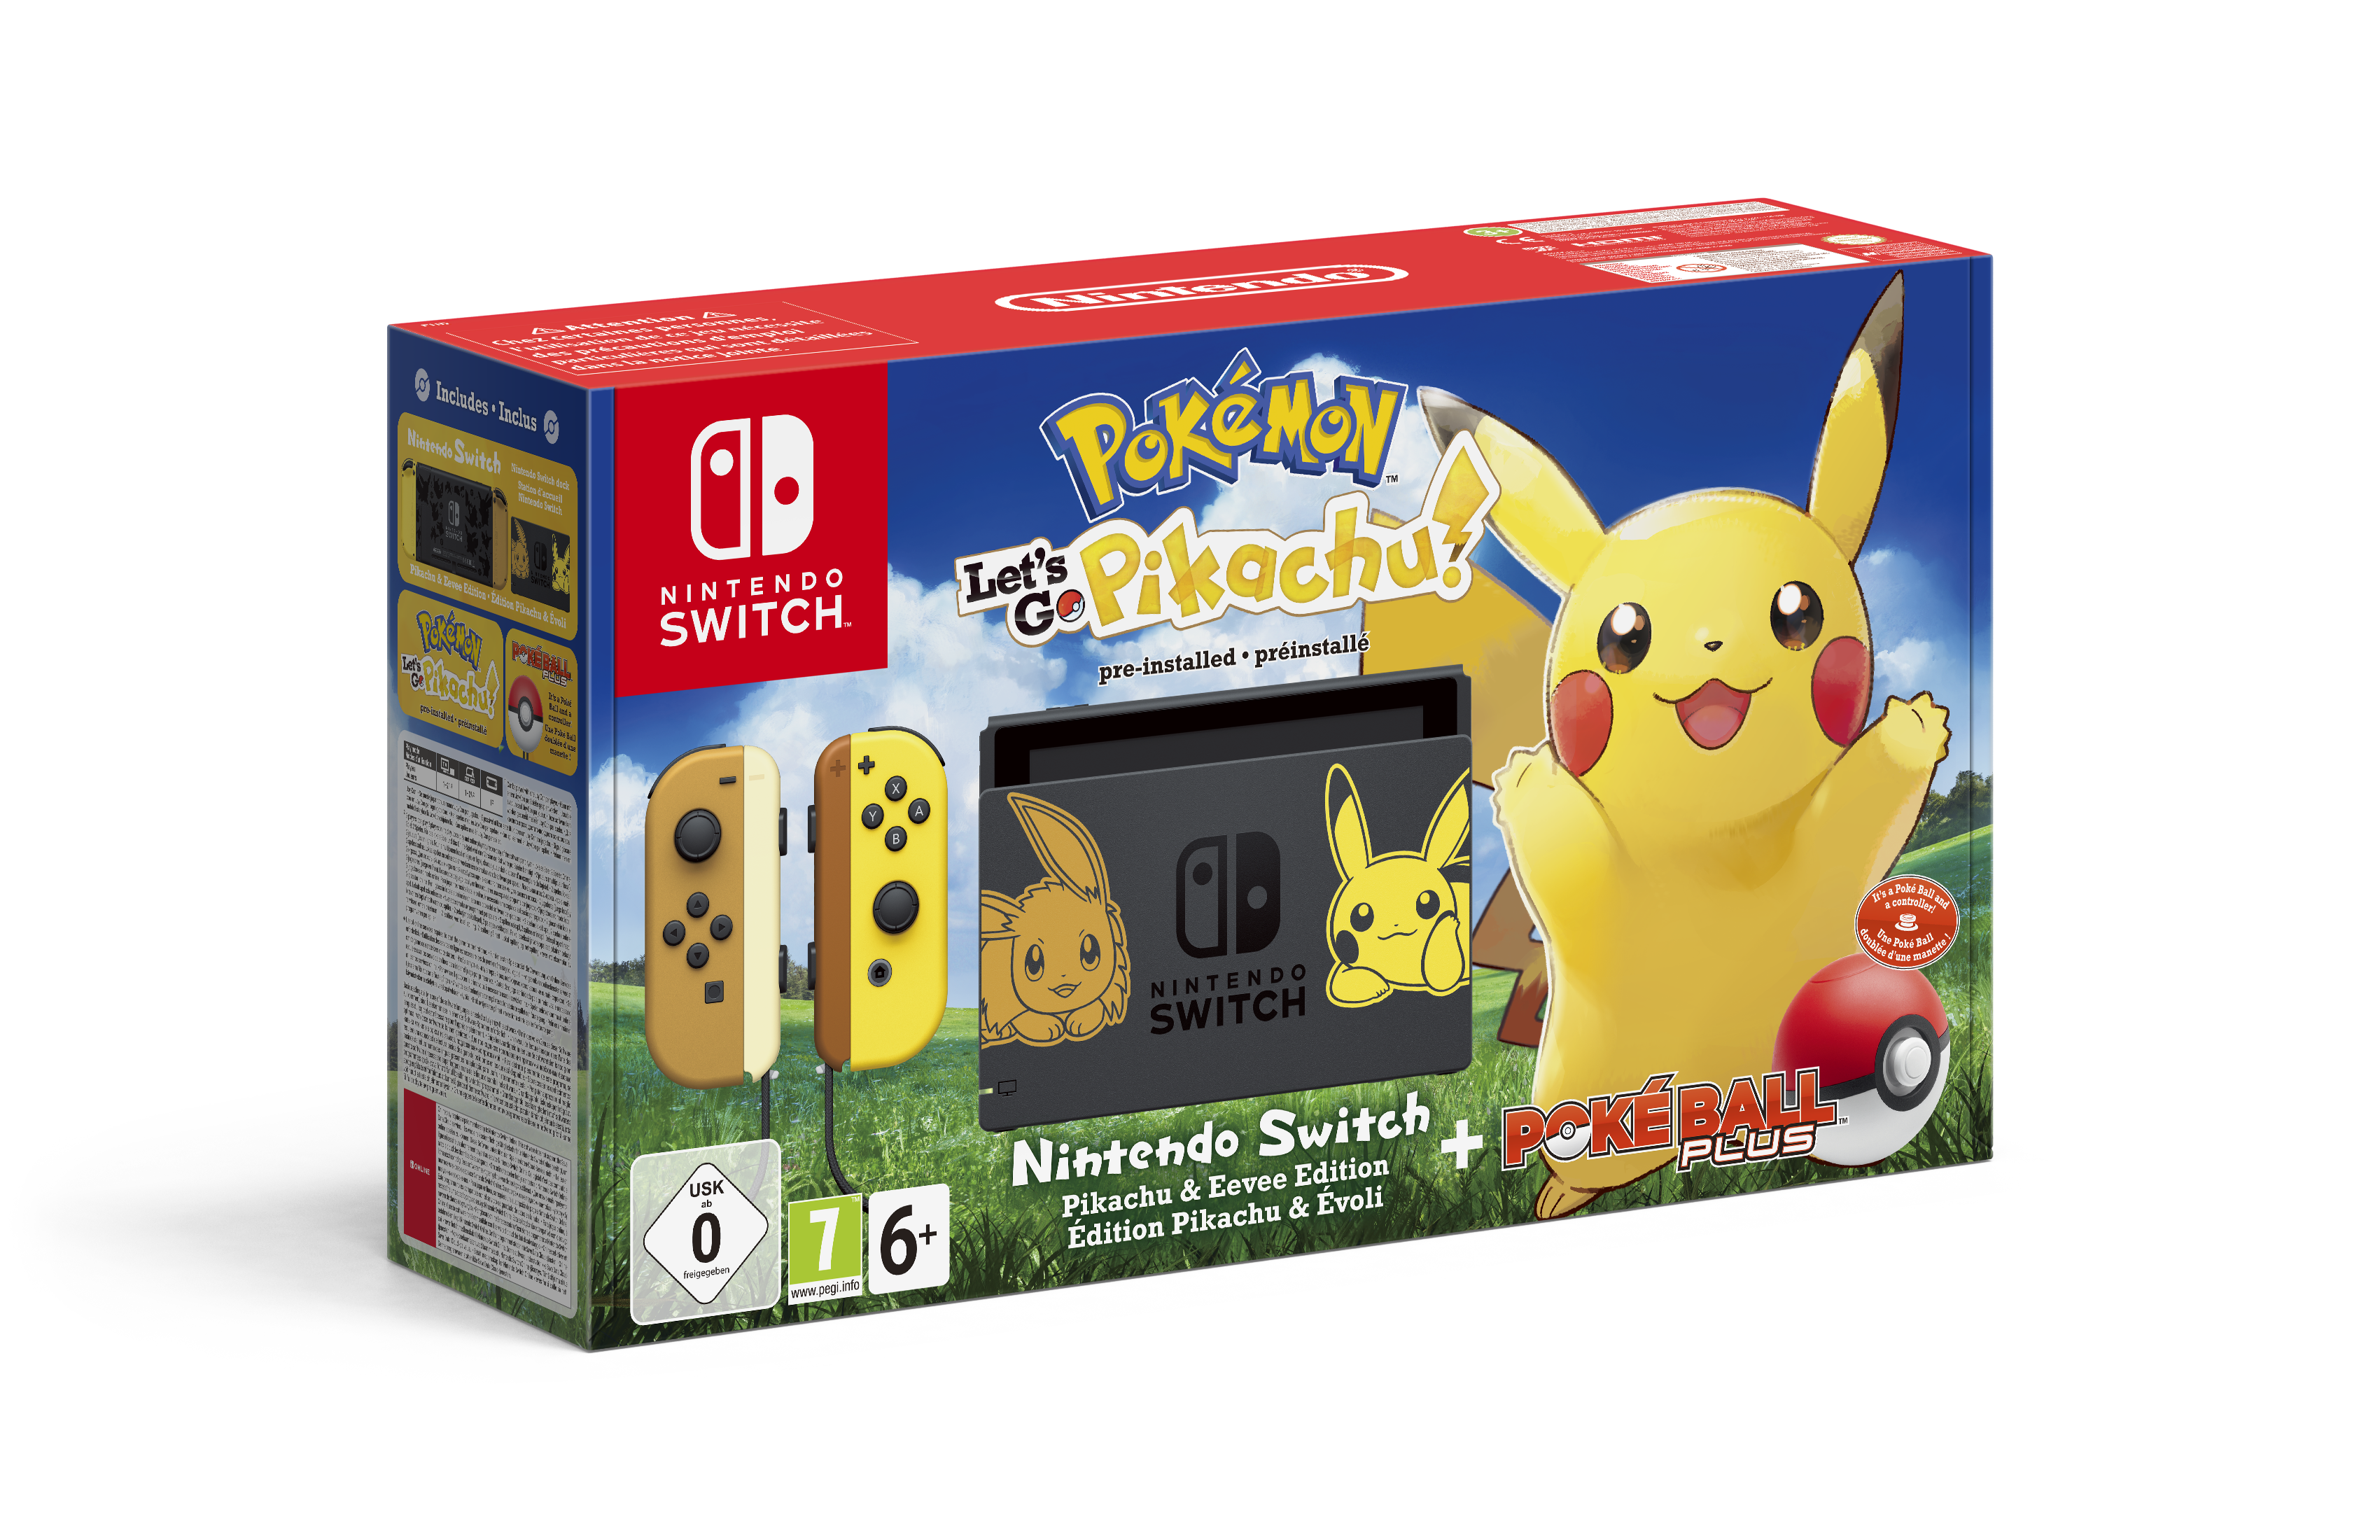 Pokemon Giocattoli Carrefour